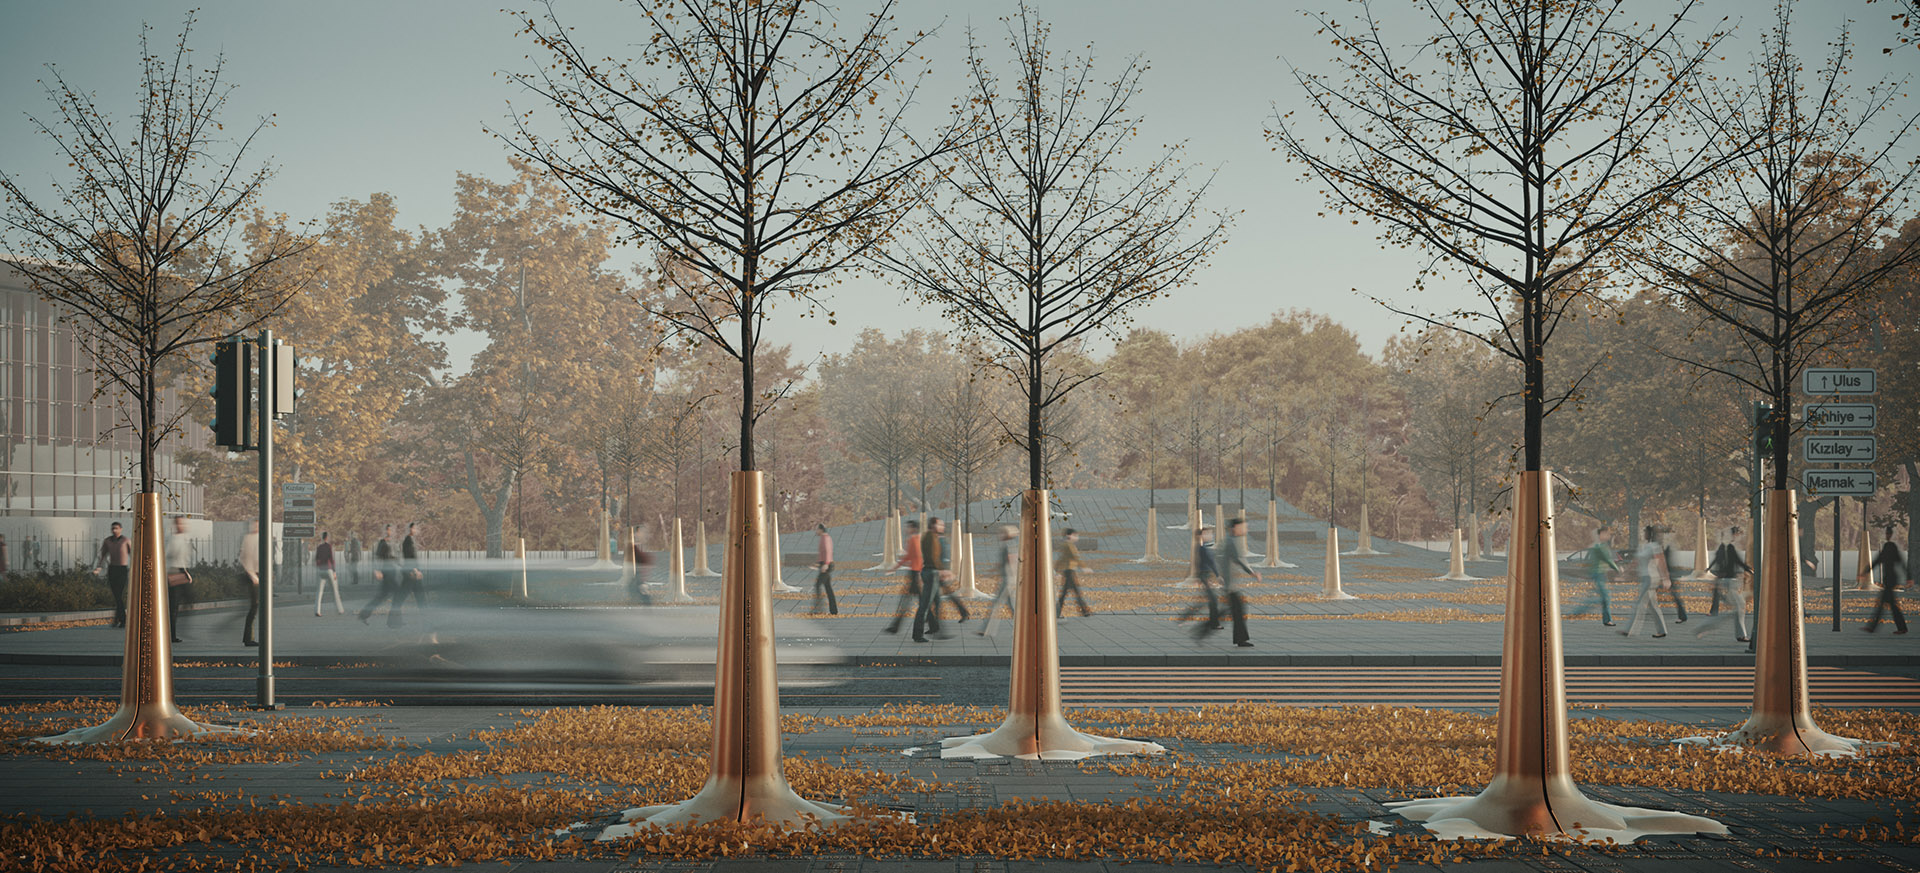 Sonbahar Mevsiminde Anıt Meydan